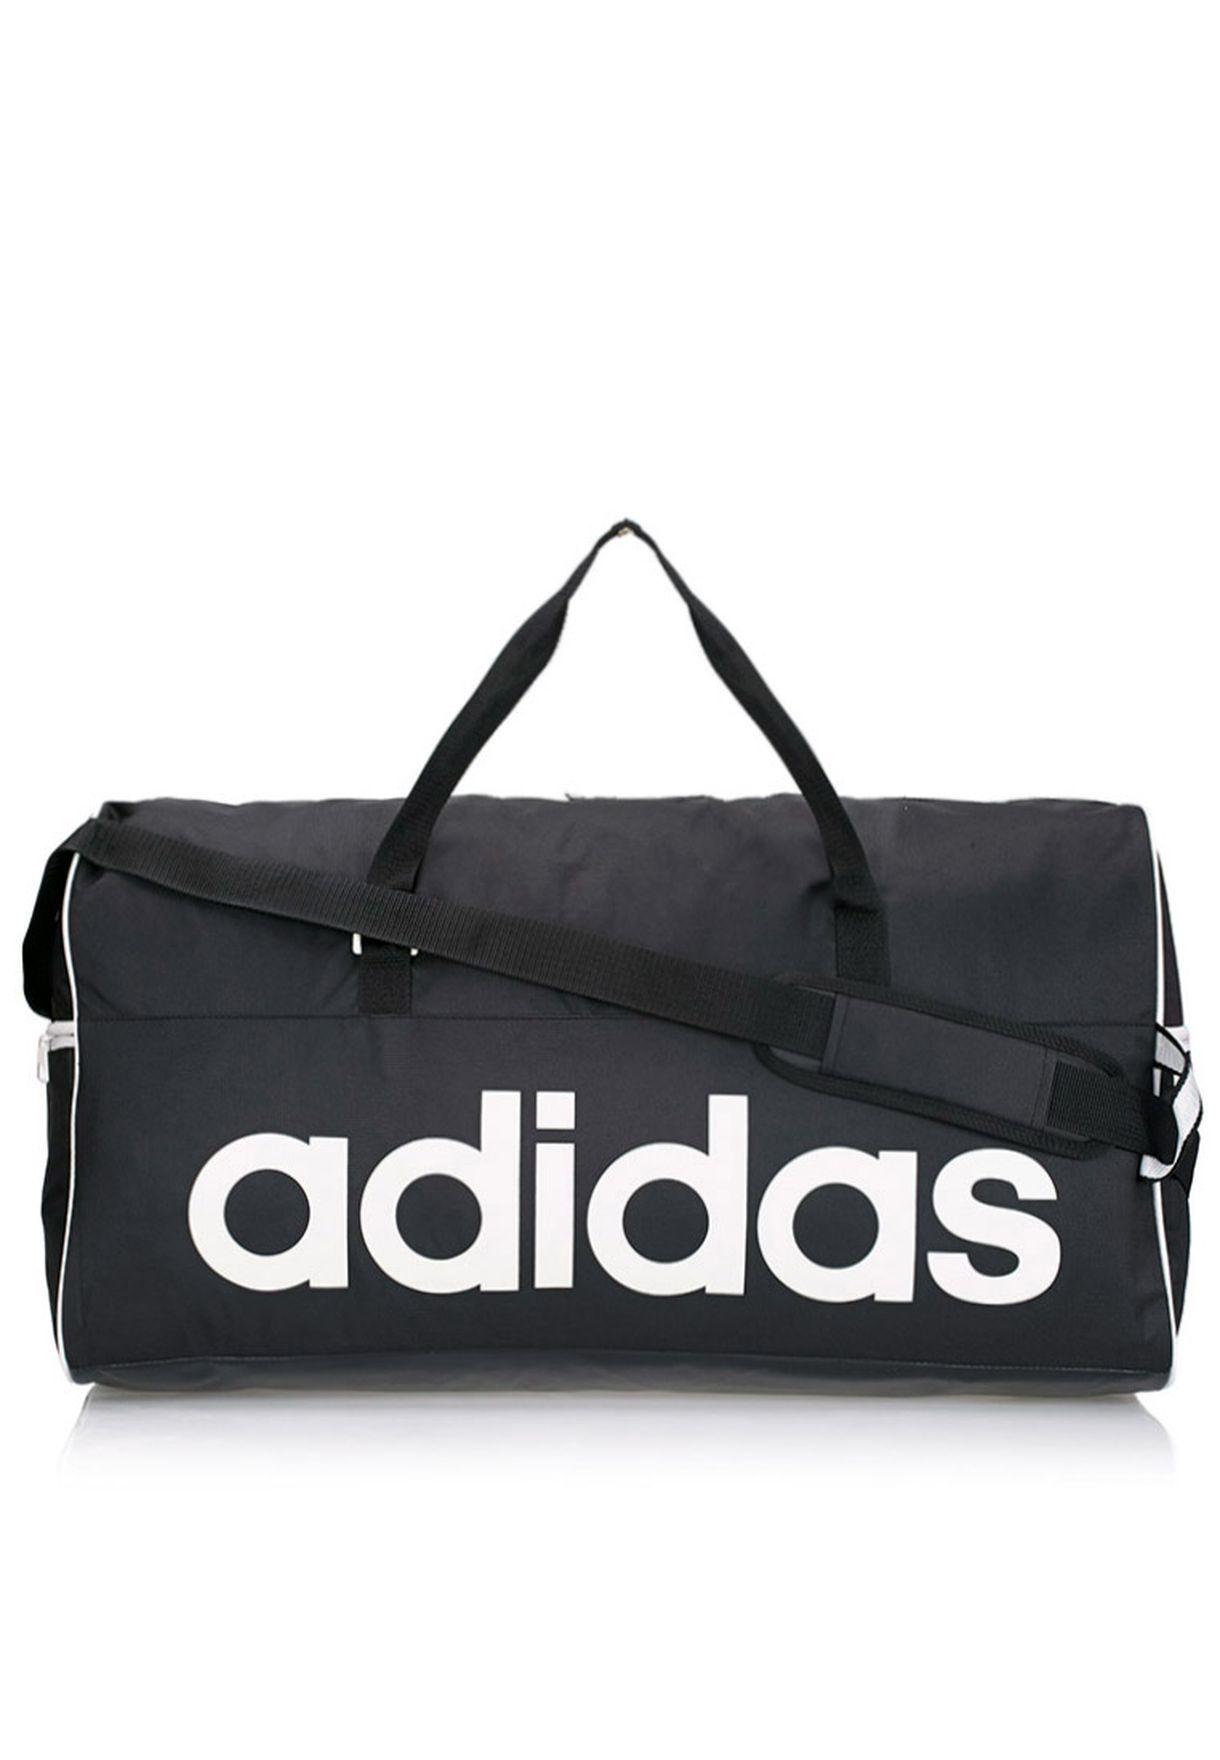 93d6ebffbbe7 Shop adidas black Large Linear Performance Duffel Bag M67875 for Men ...